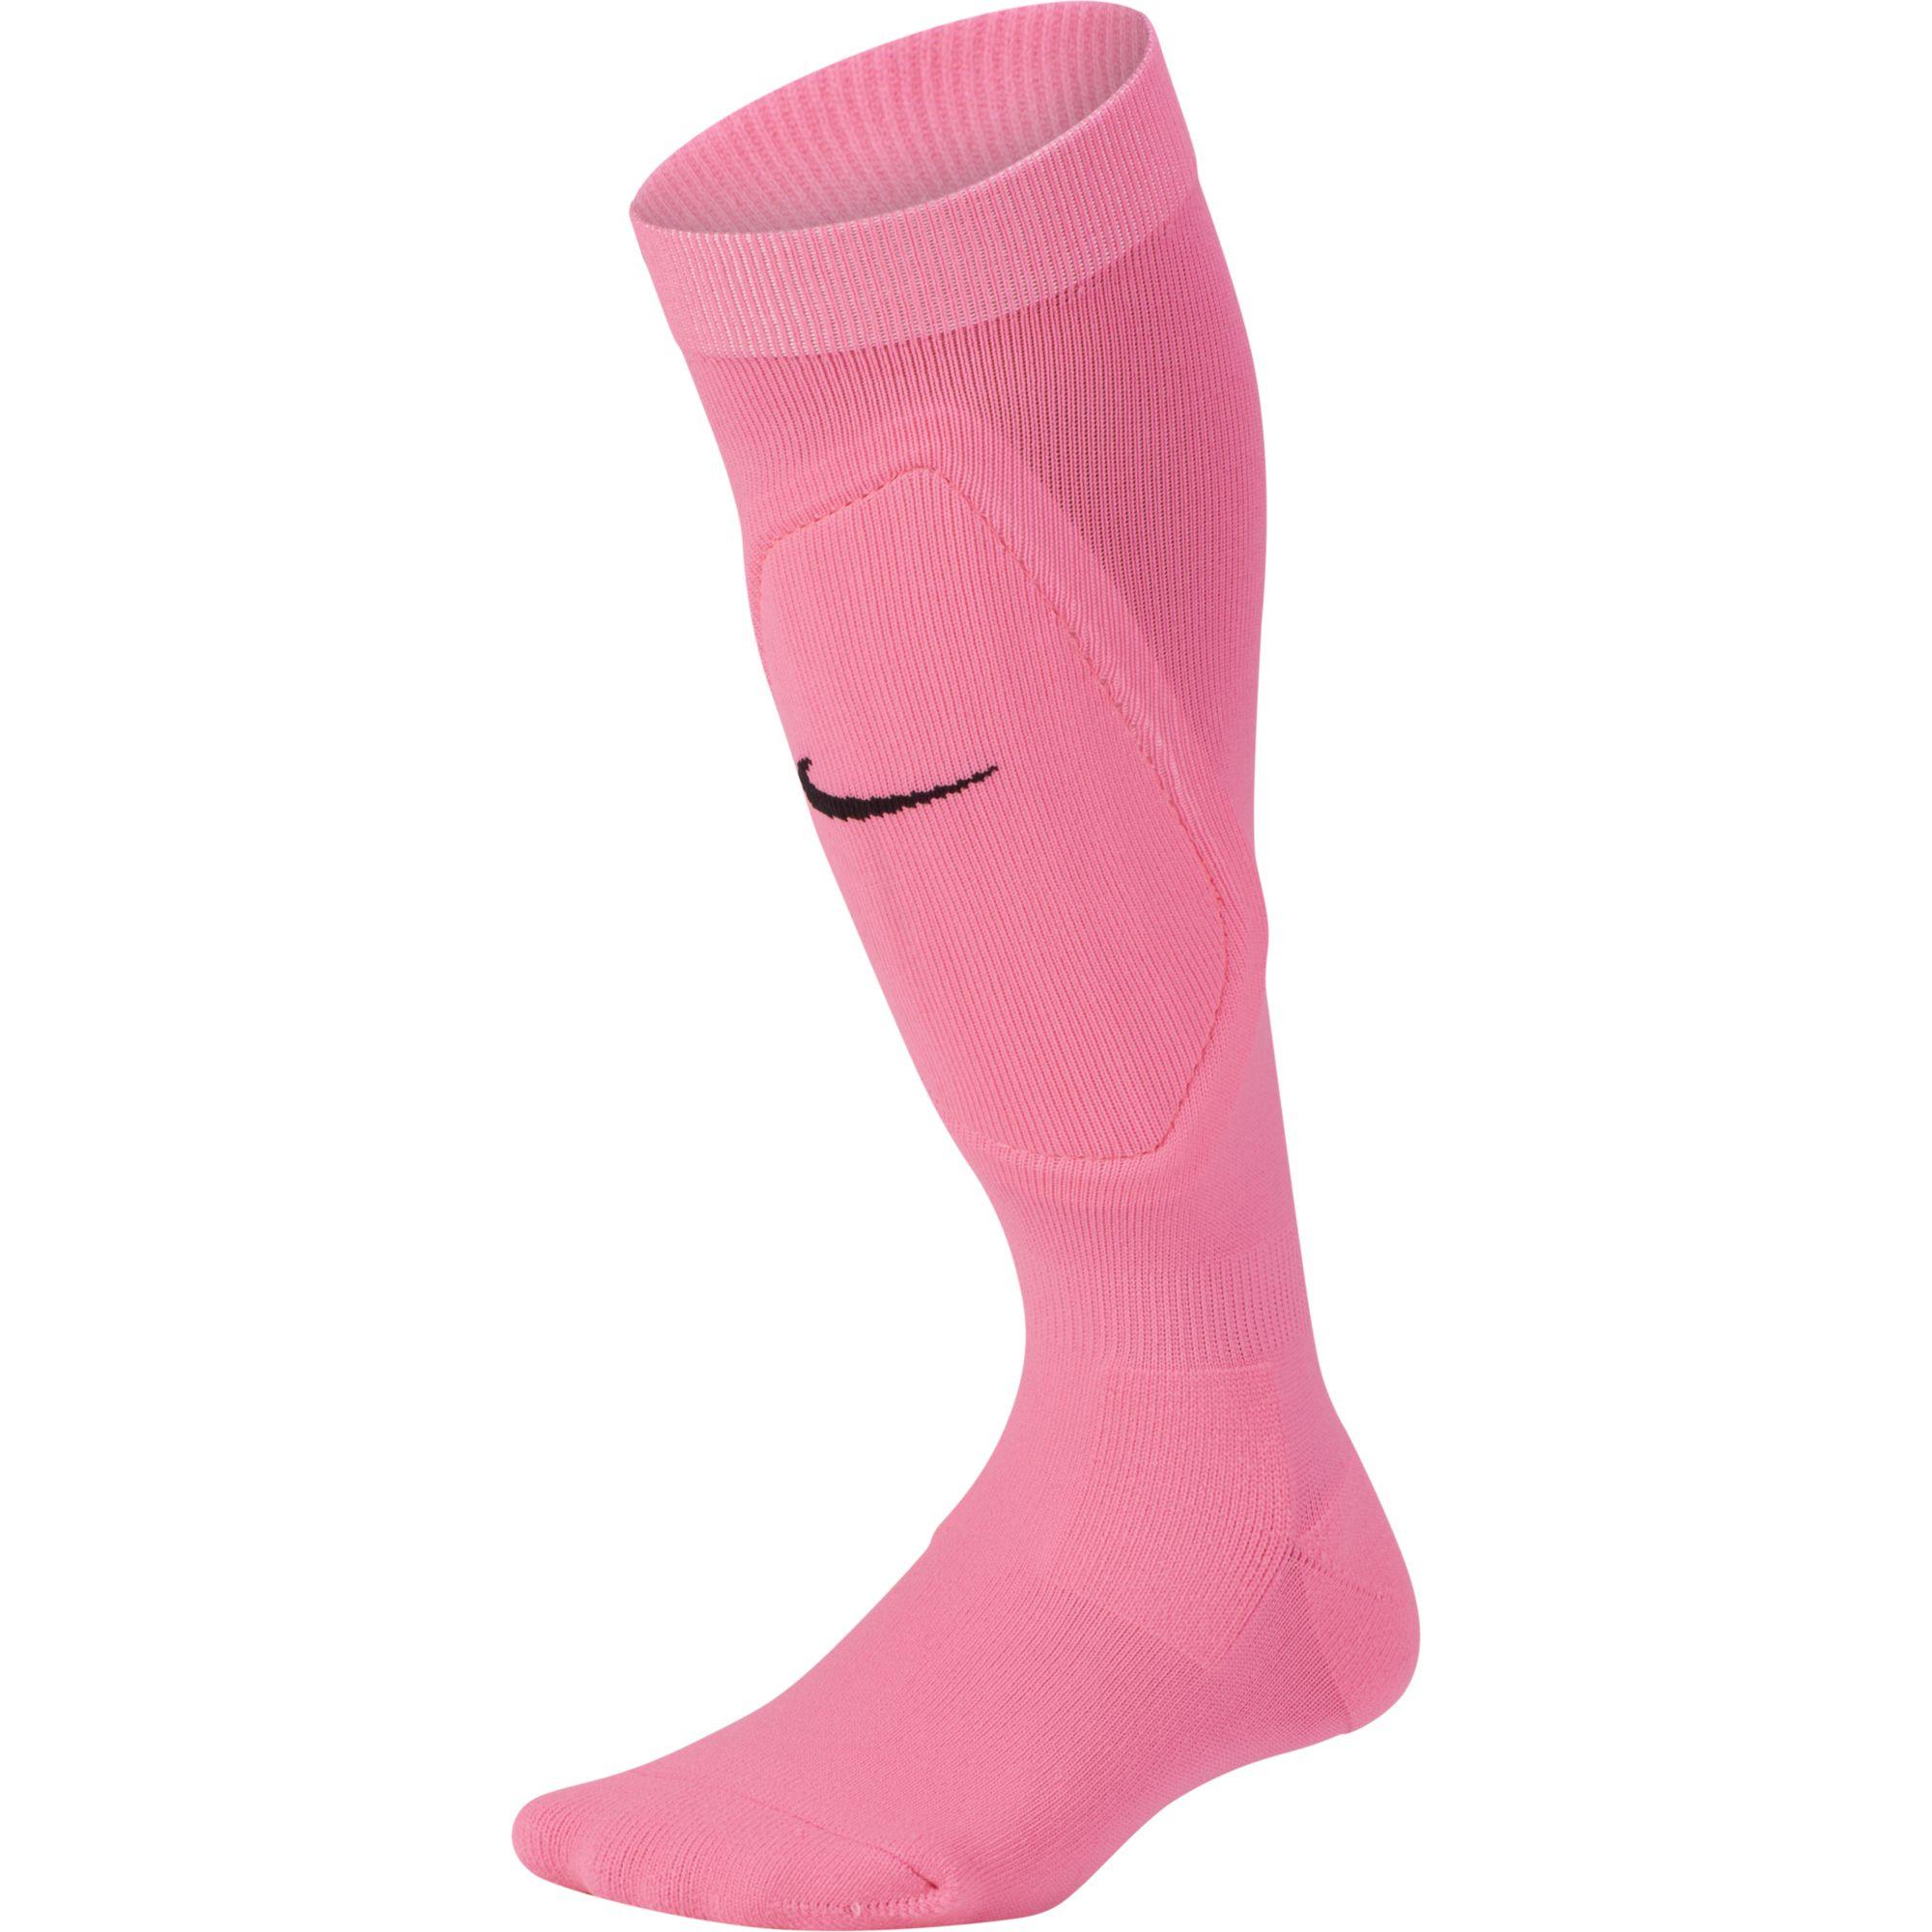 Shin Sock III Shin Guard, Pink, swatch